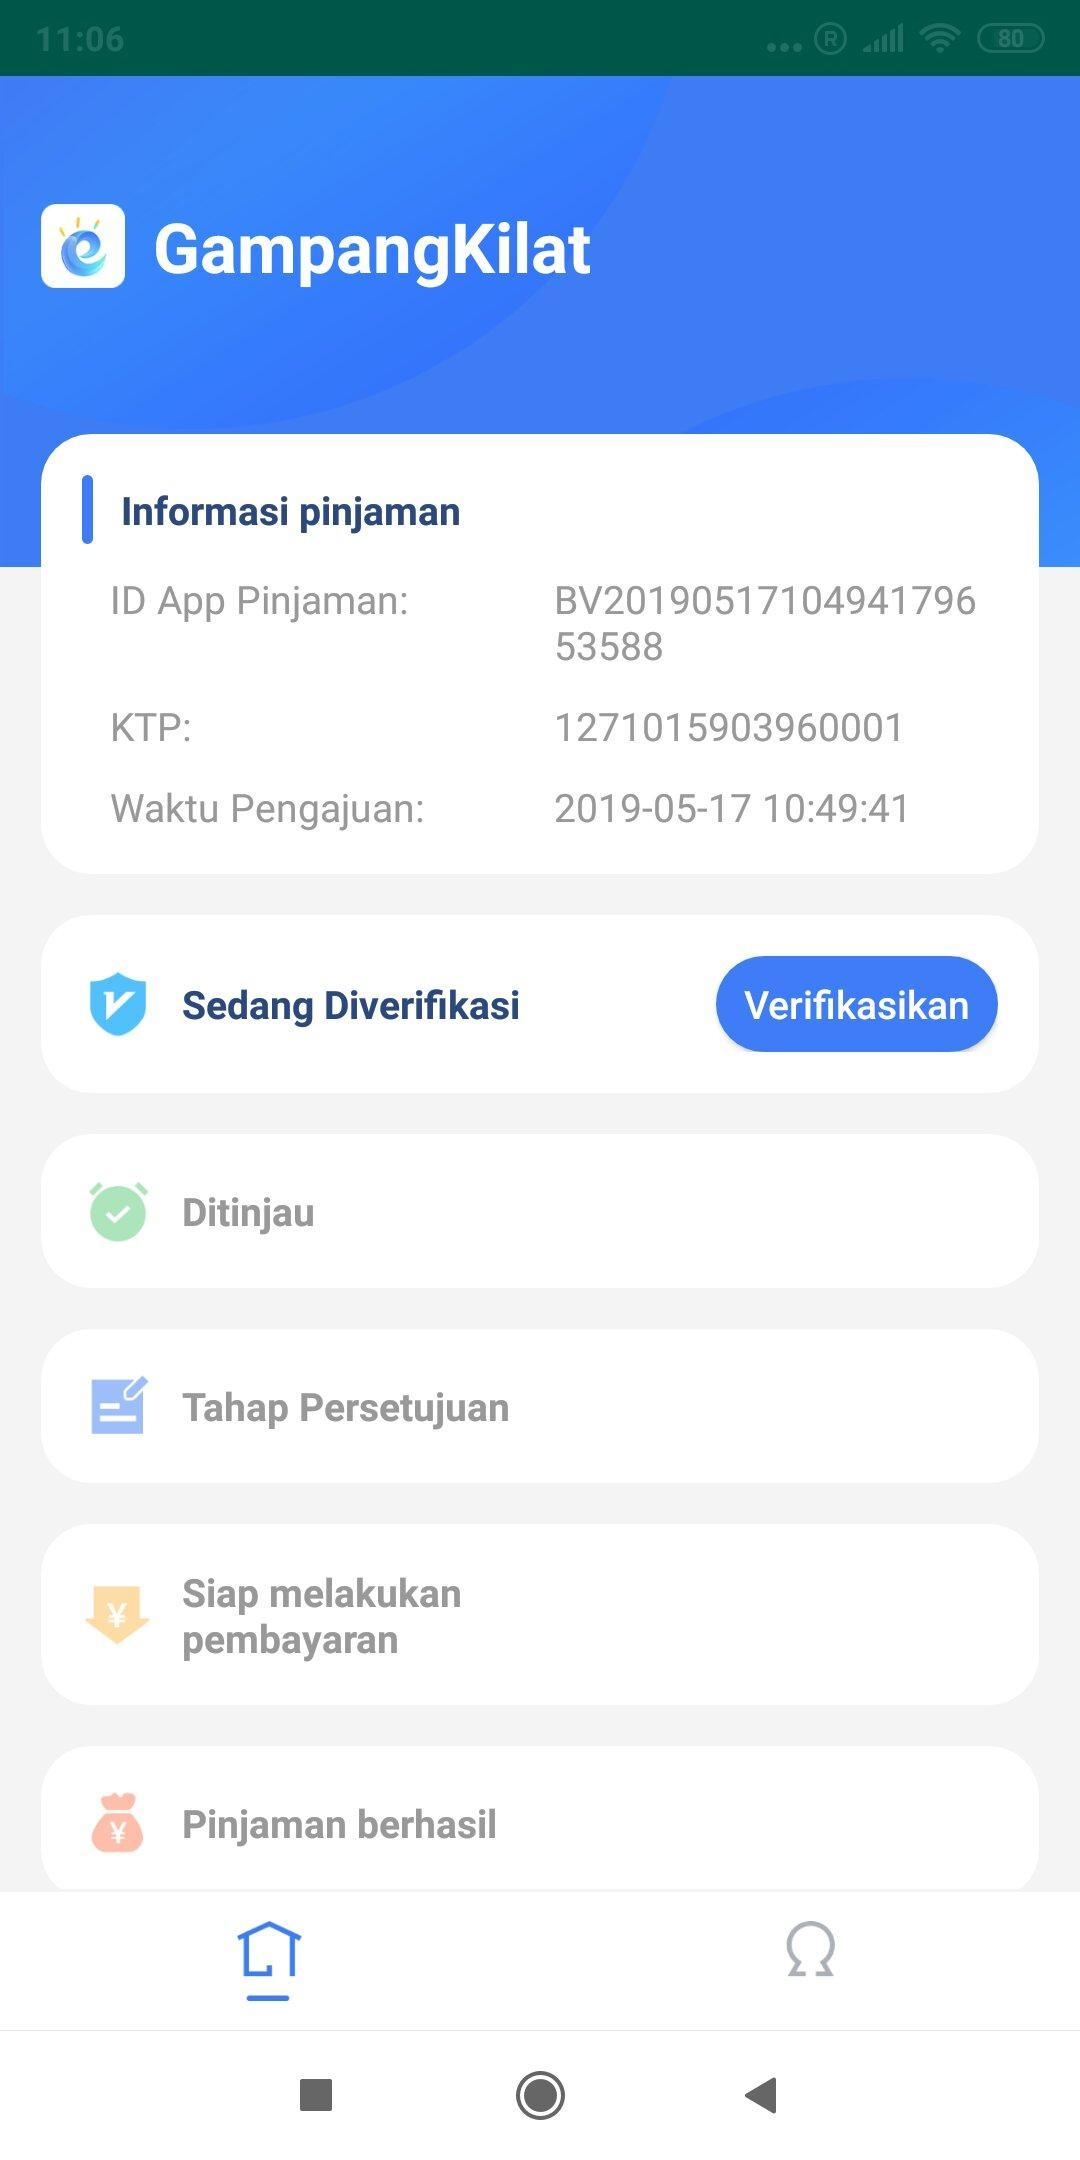 Aplikasi store Gampang Kilat